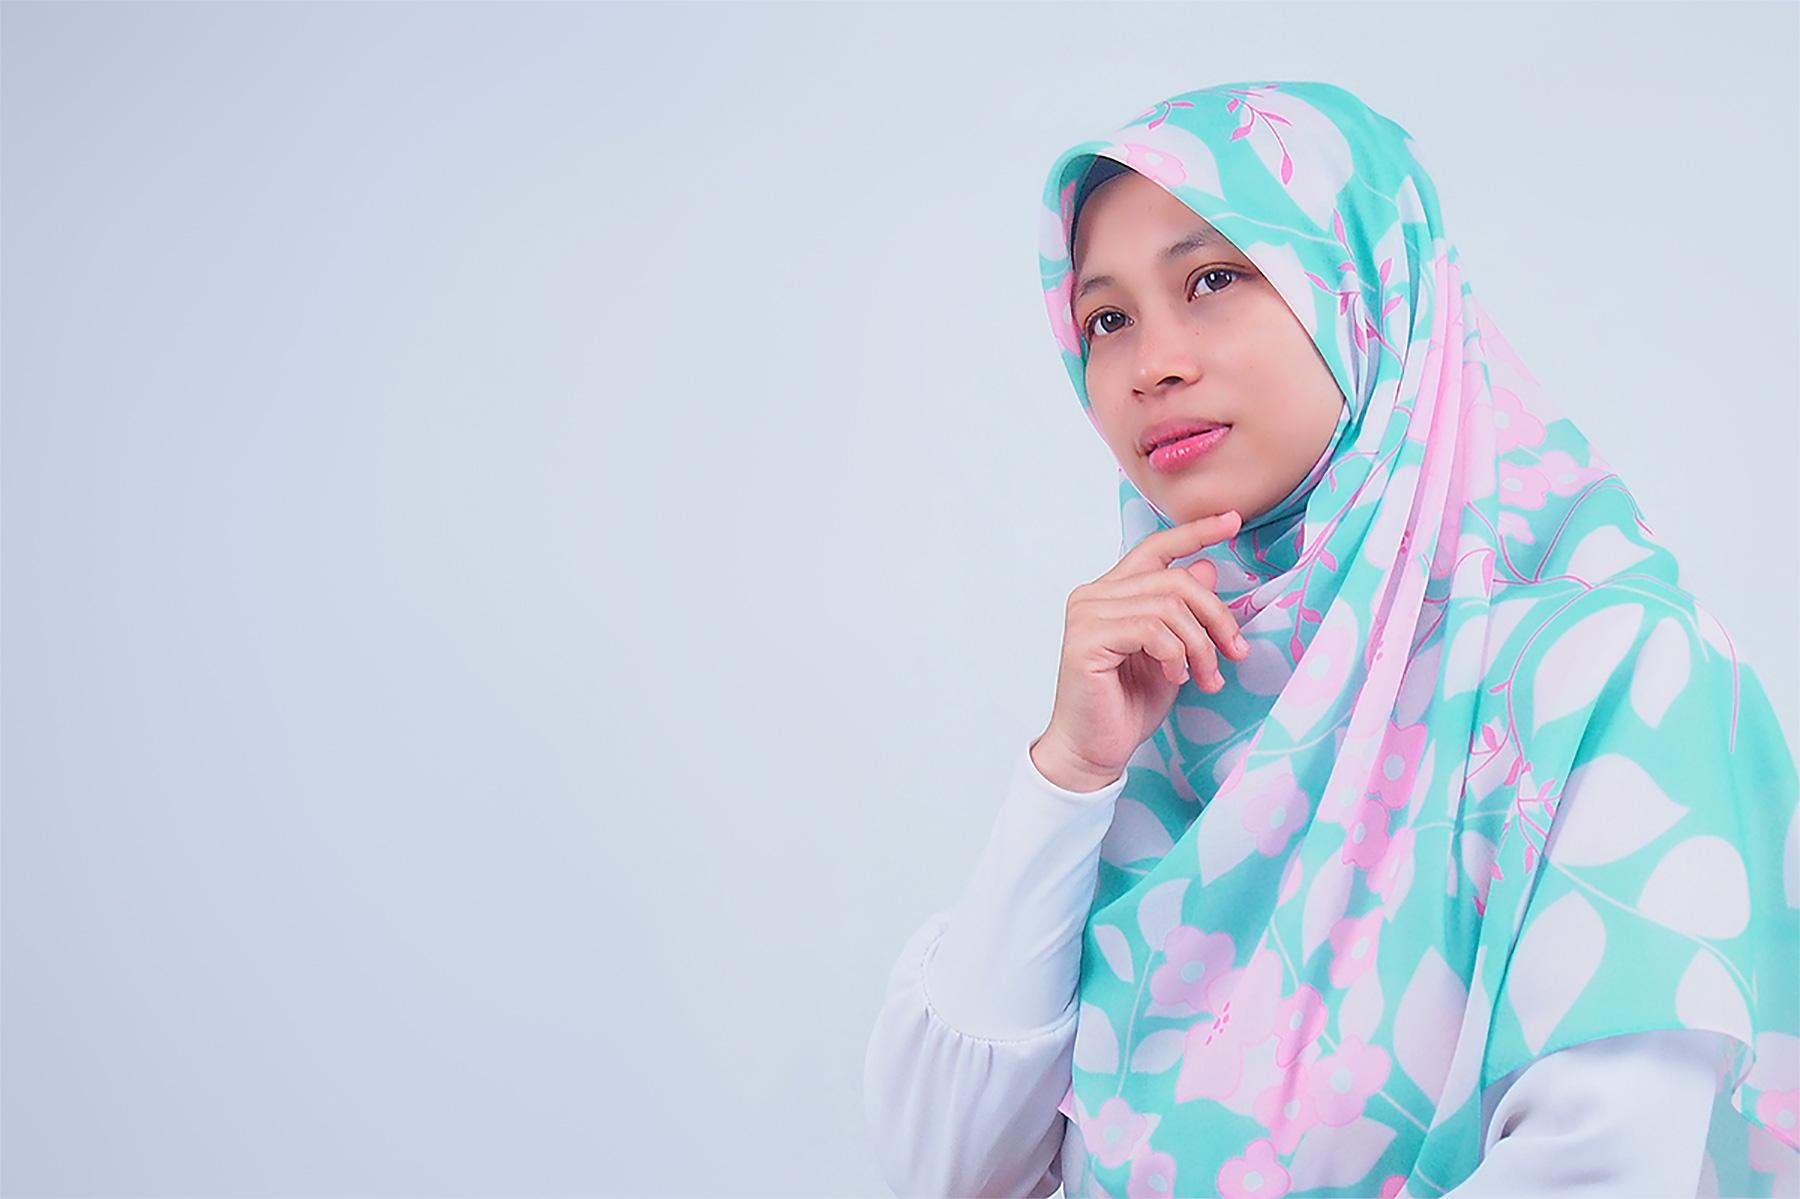 Tudung Bawal Labuh Bidang 50 Cotton Turki Luna Series Slider | AnnurNida